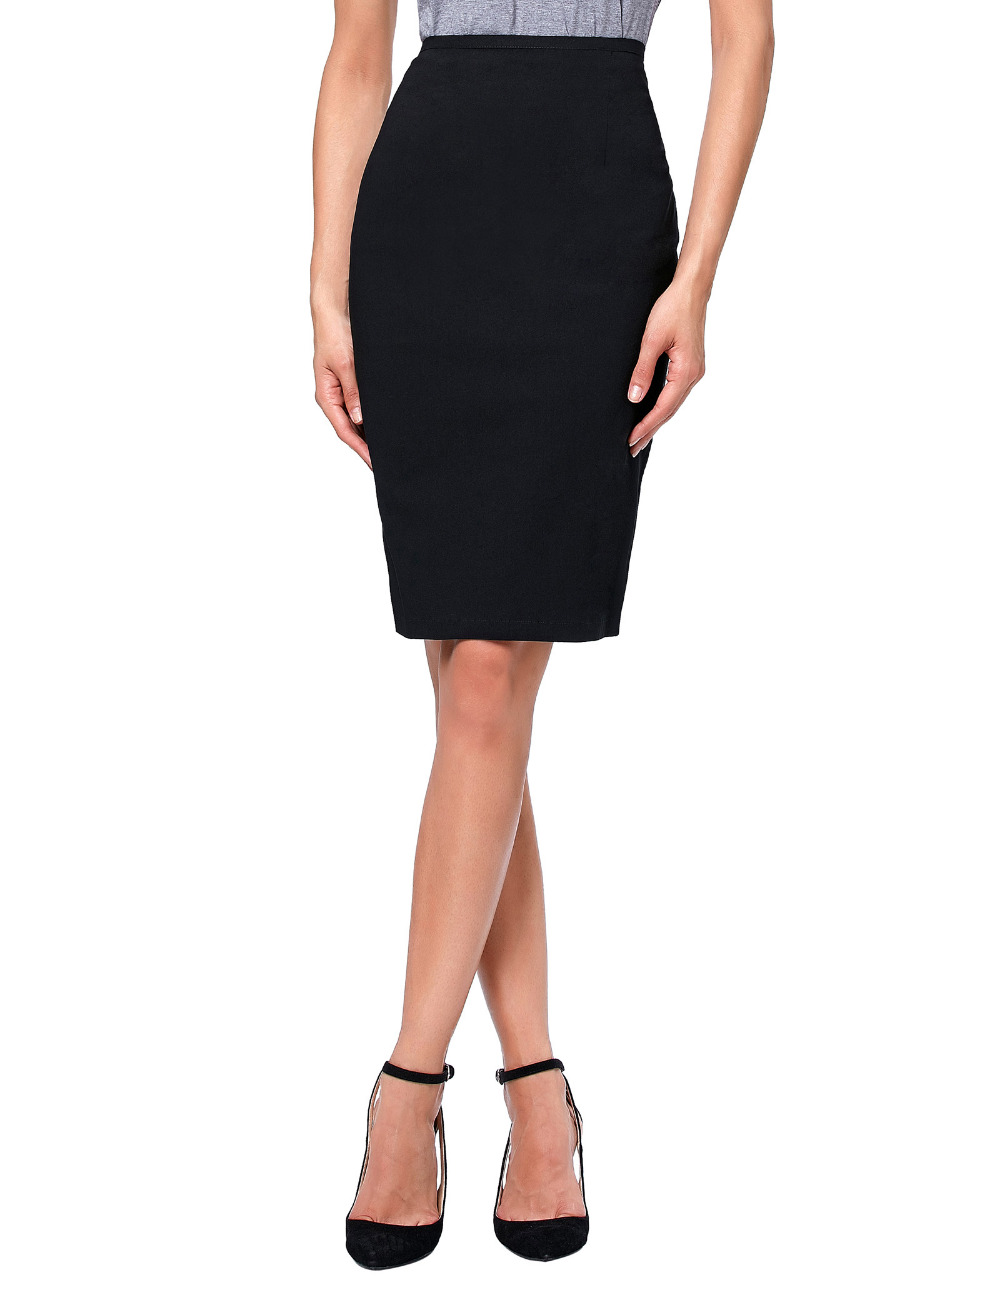 Popular Wear Black Pencil Skirt-Buy Cheap Wear Black Pencil Skirt ...